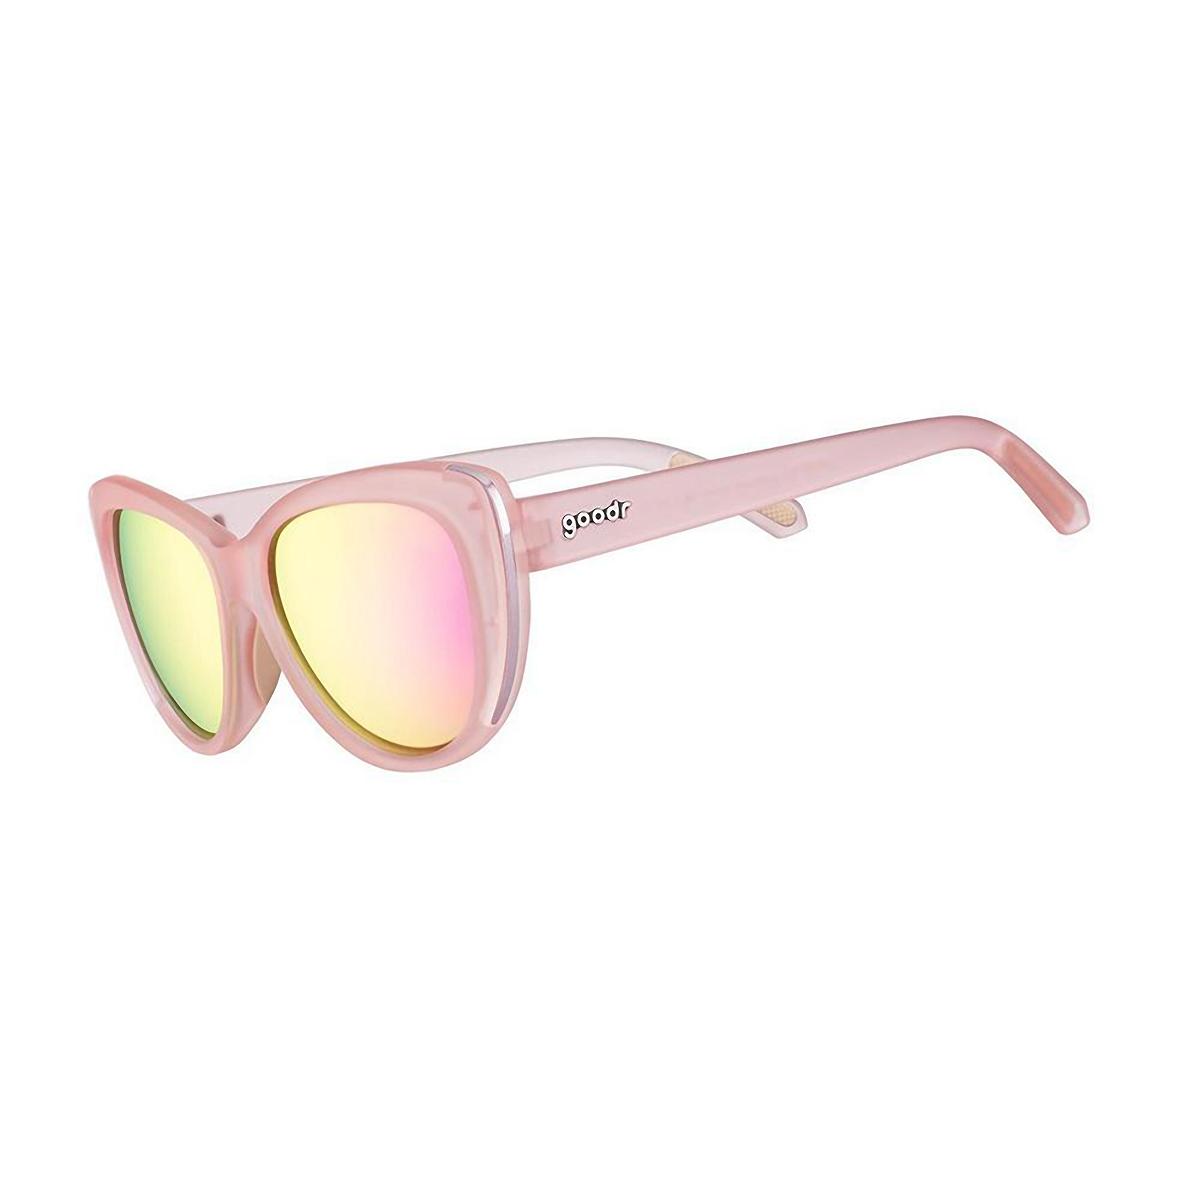 Women's Goodr Ros? Before Bros? Sunglasses - Color: Rose